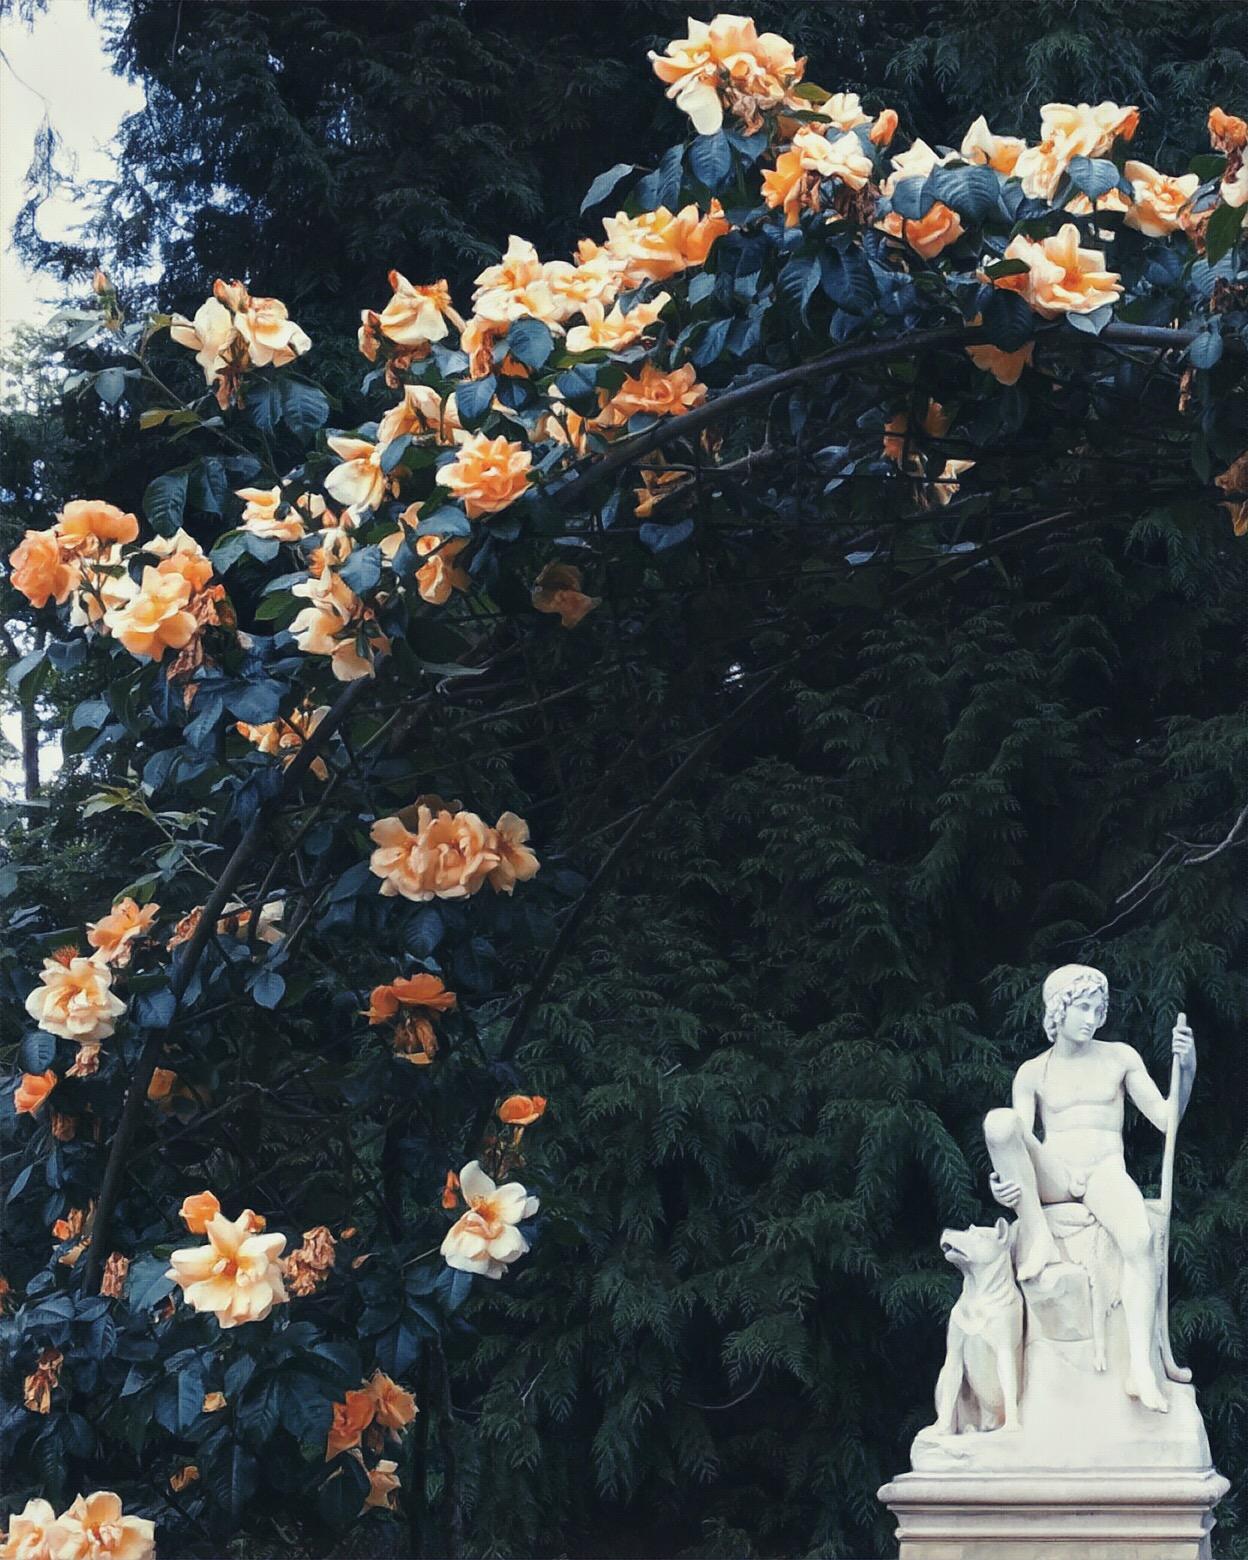 A view of the rose garden. © Eileen Hsieh / Follow That Bug